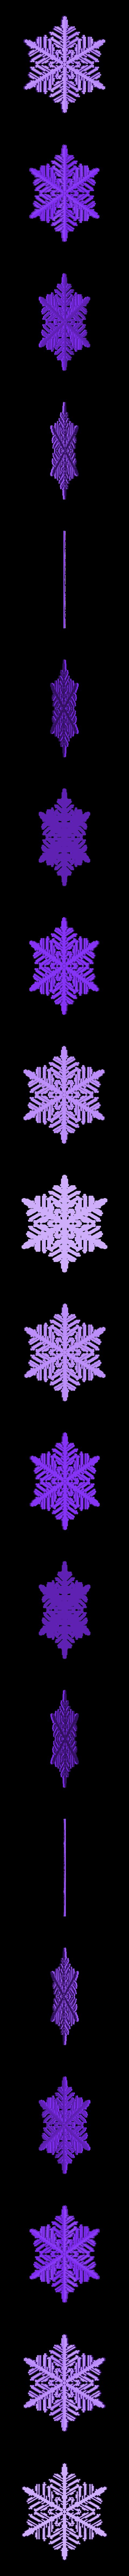 r40-rg5.stl Download free STL file Snowflake growth simulation in BlocksCAD • 3D printing design, arpruss